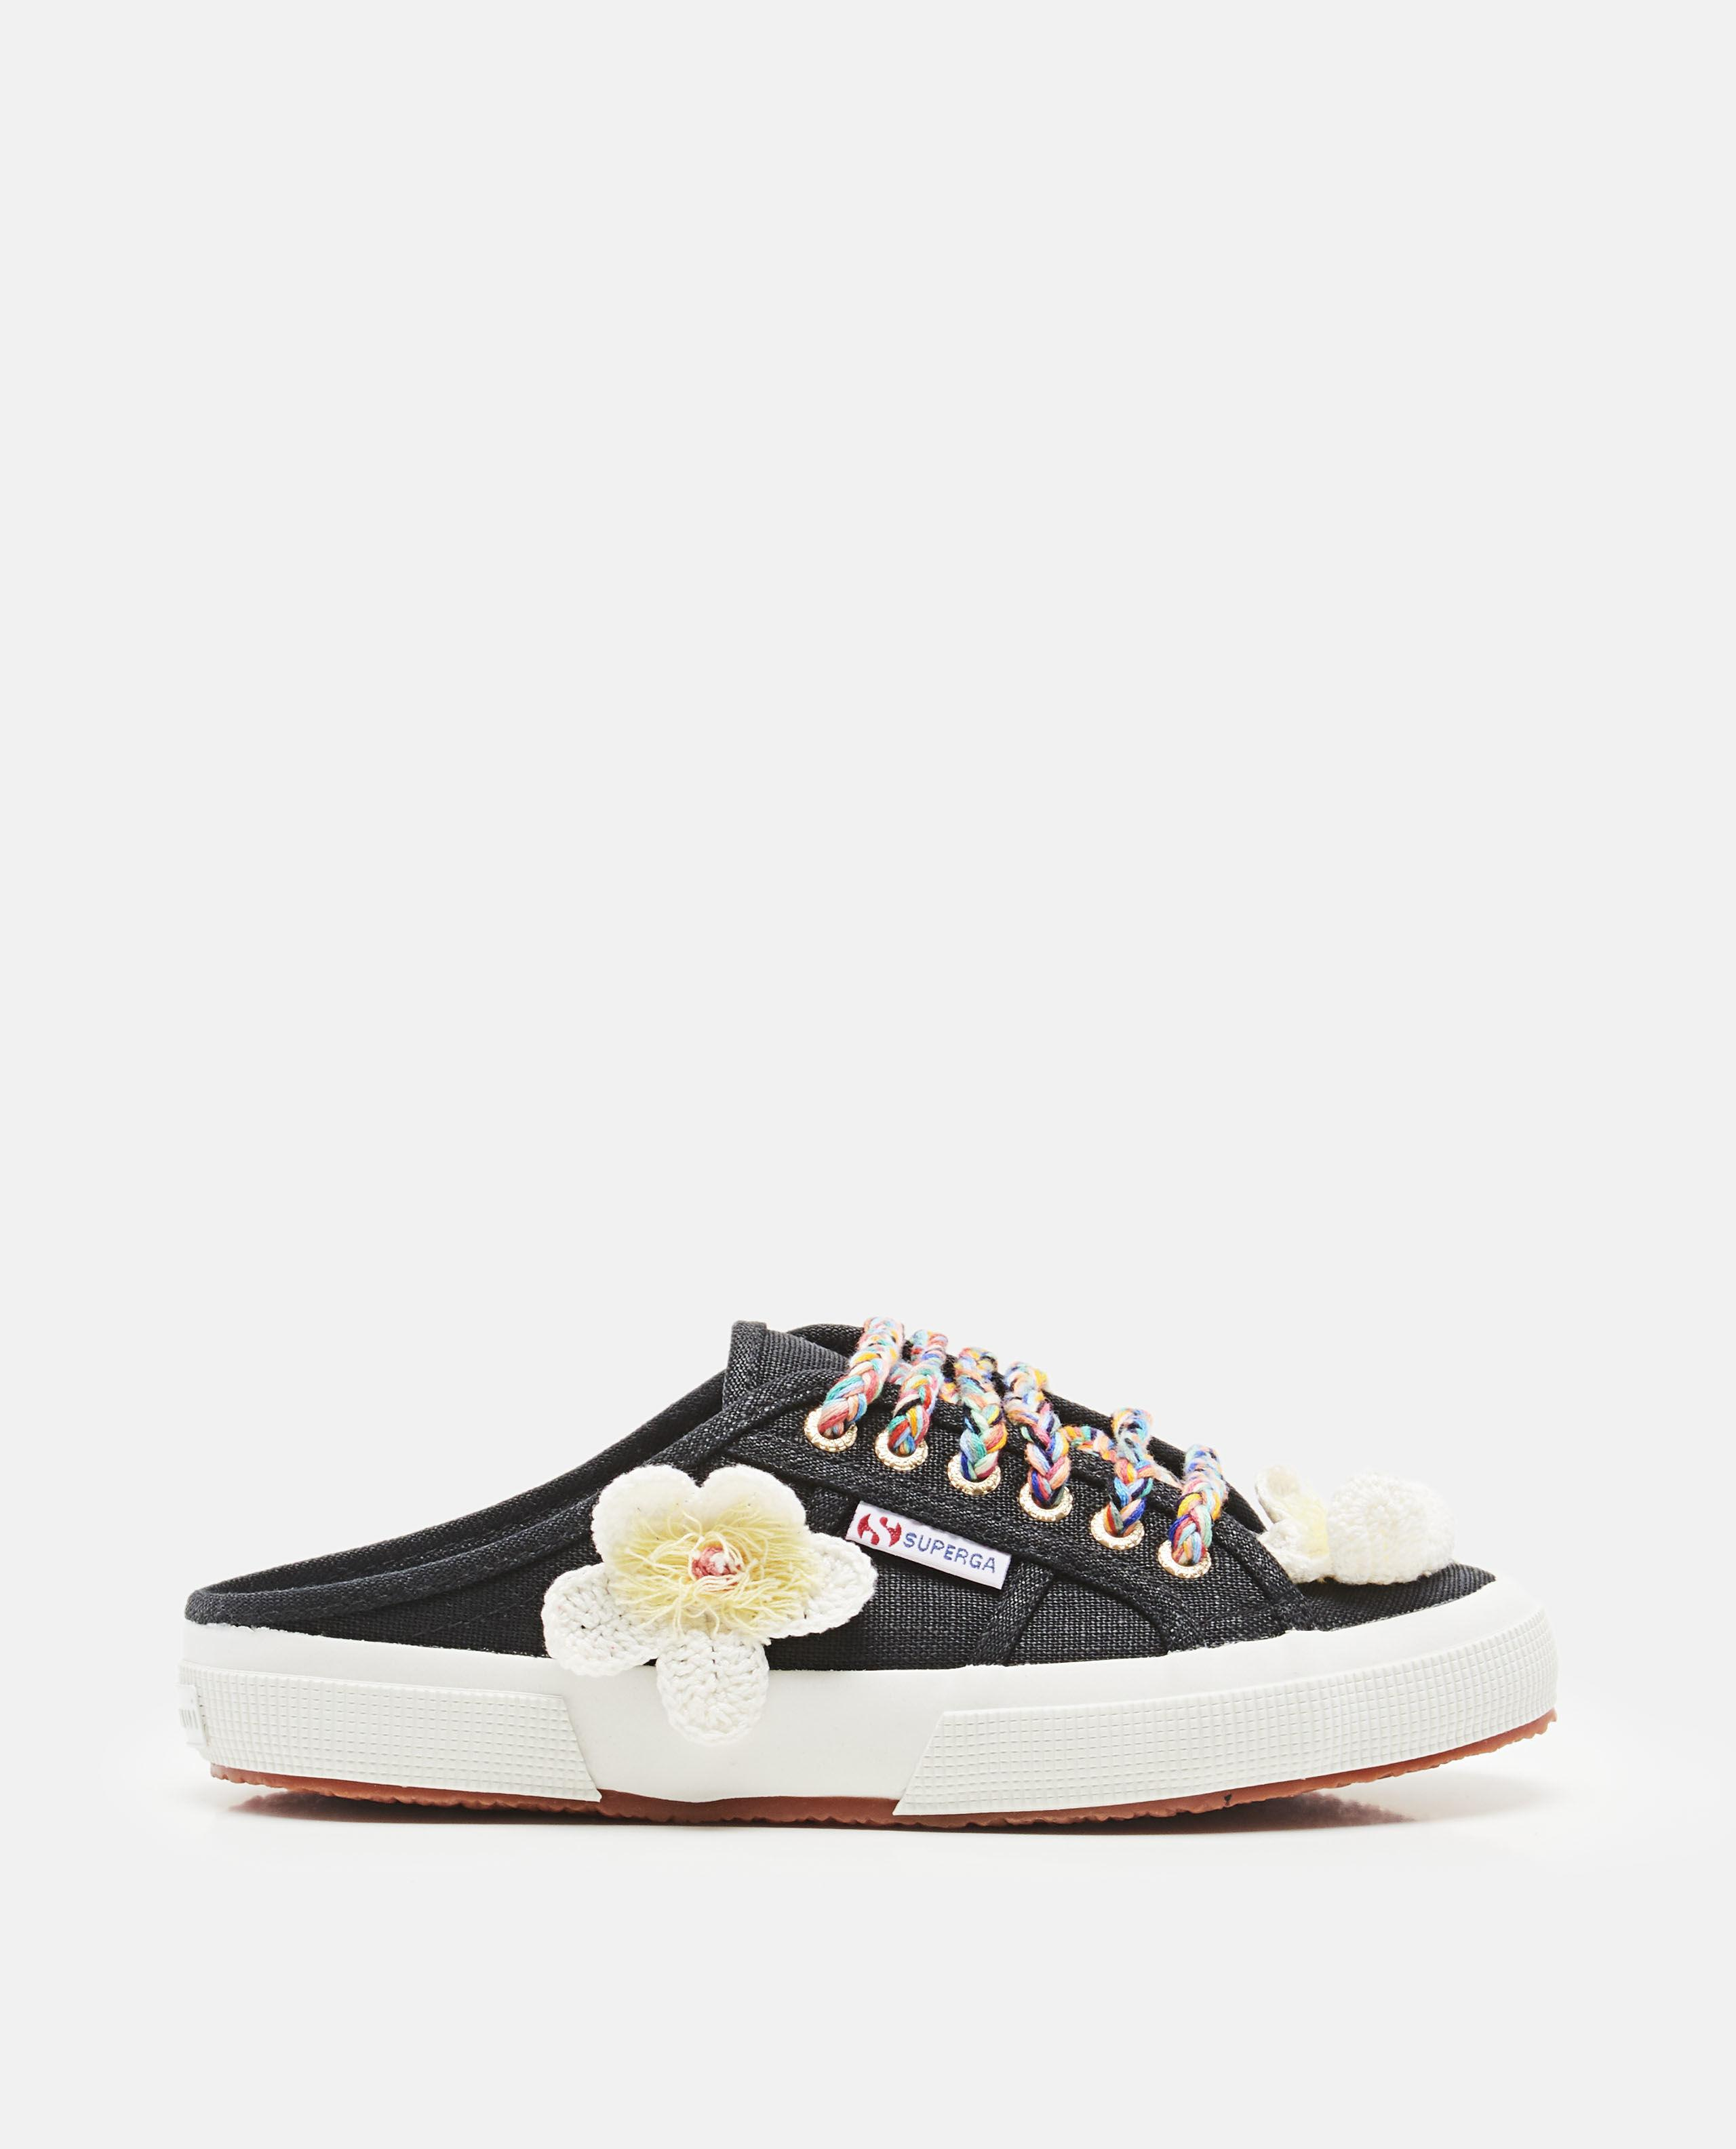 158e454cbdc7 Alanui - White X Superga Flowers Mule Sneakers - Lyst. View fullscreen